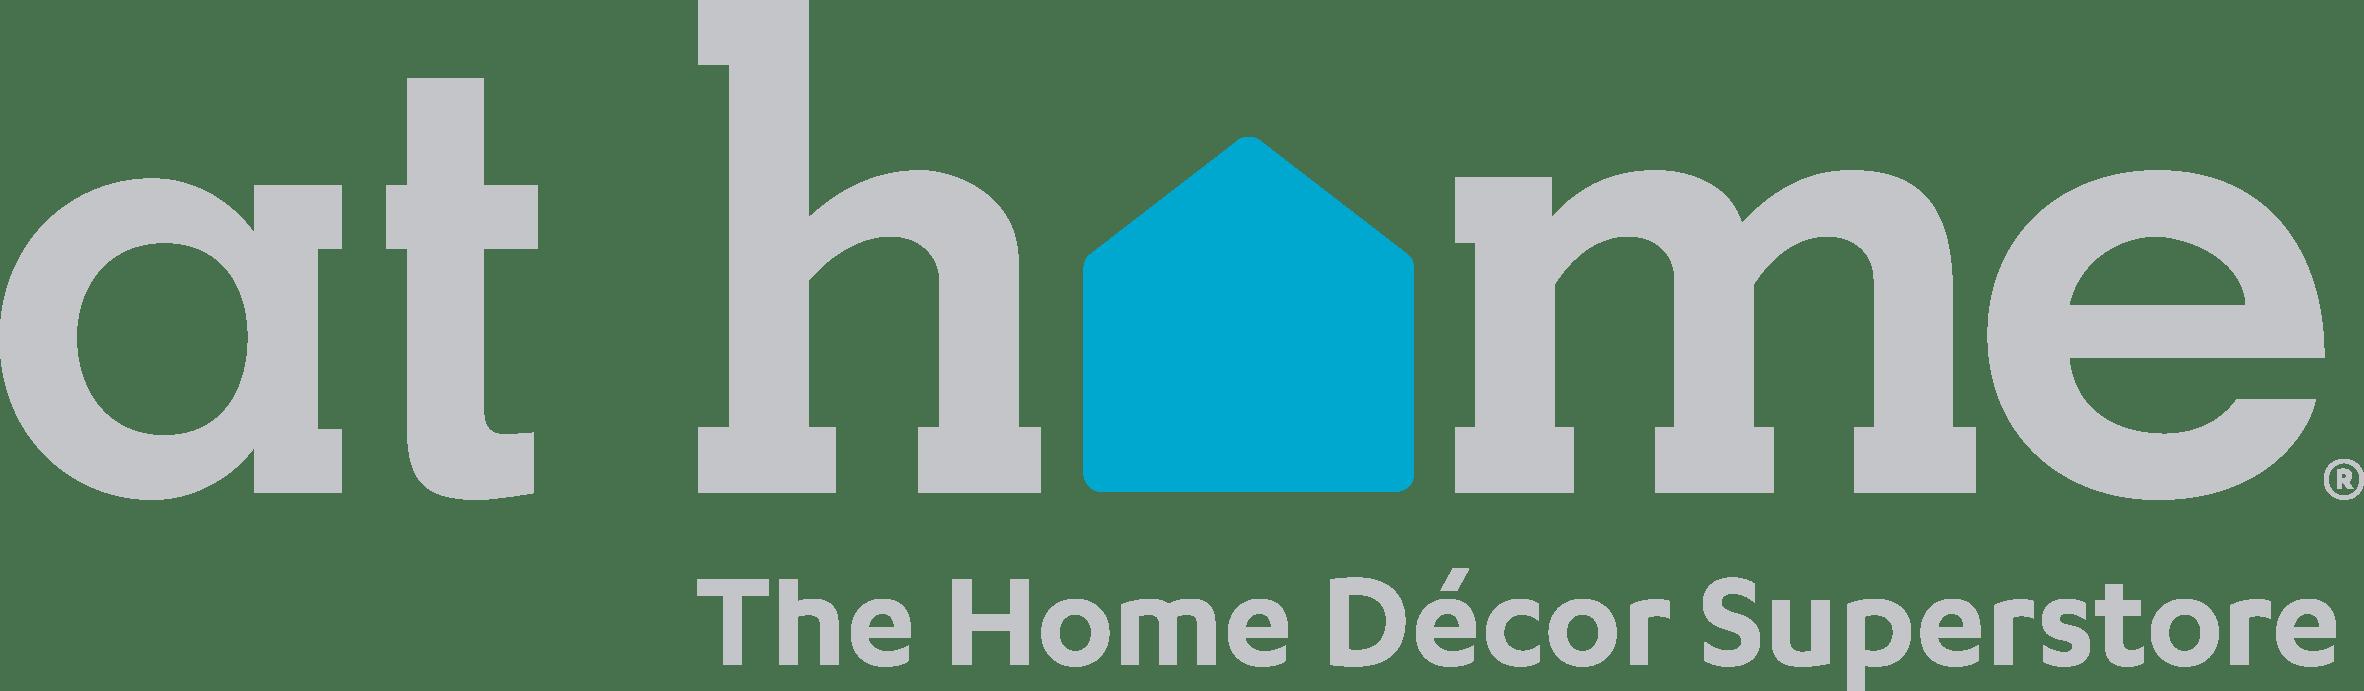 Wholesale Home Decor Distributors